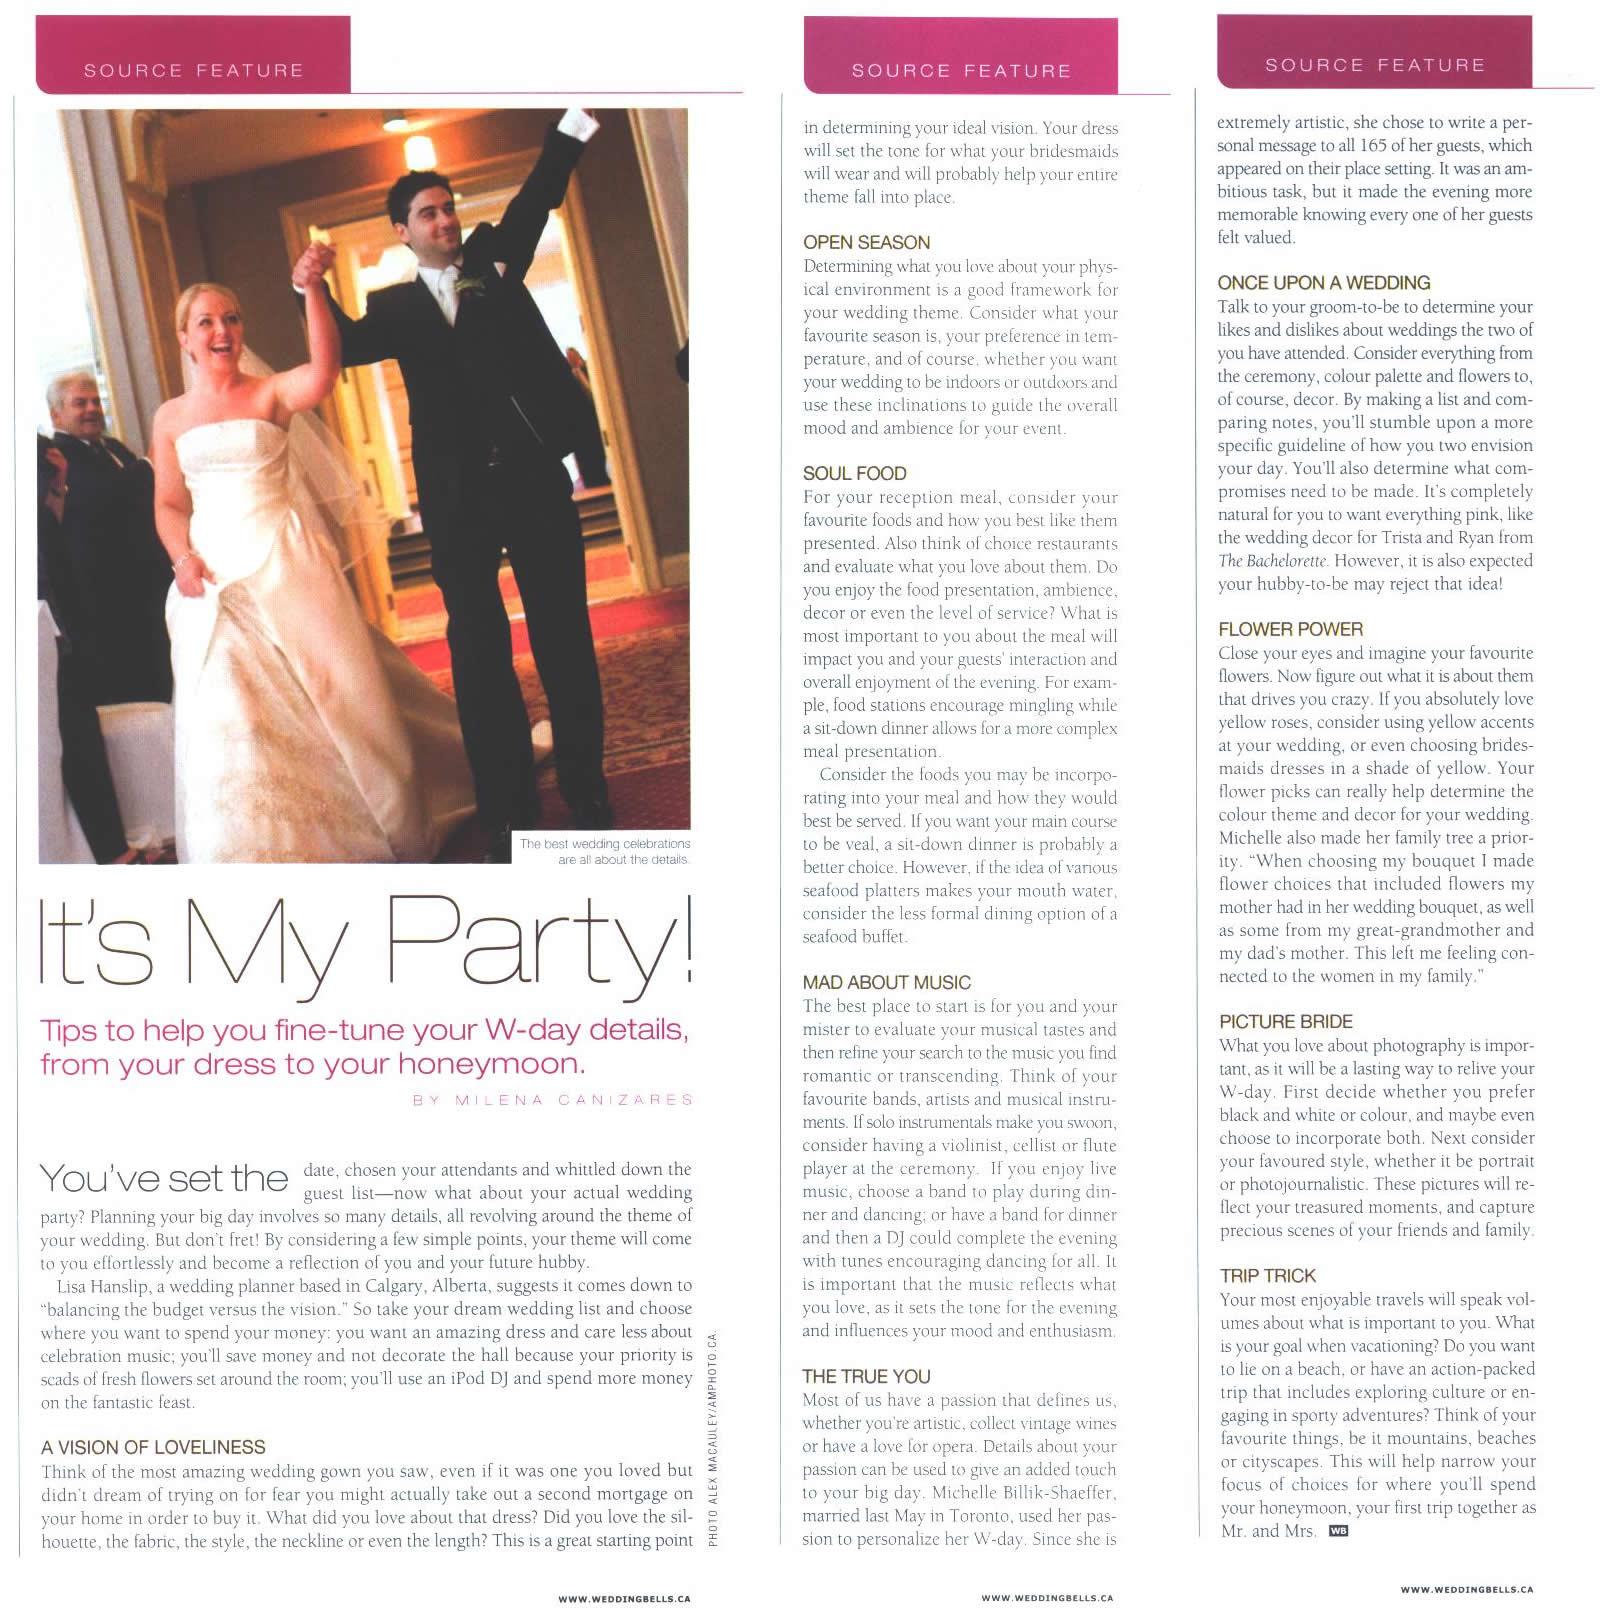 the wedding planner - planning stylish events in calgary, banff, lake louise, kananaskis, rocky ...